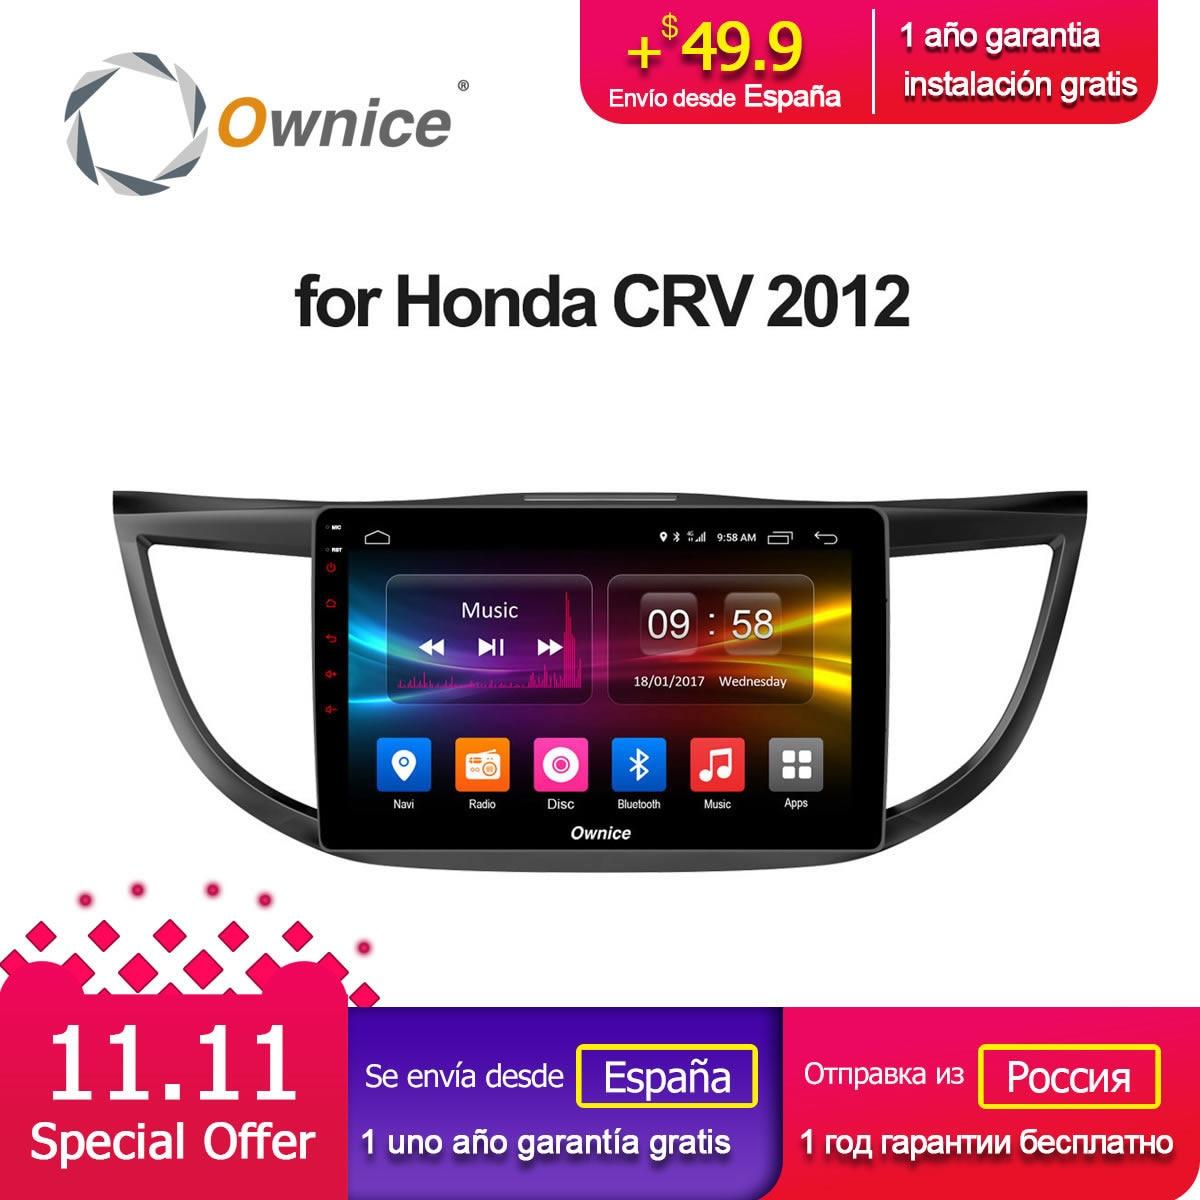 Ownice C500 + G10 Octa base Android 8.1 Pour Honda CRV 2012 2013 2014 2015 2016 Voiture Radio Lecteur Navi GPS 2 gb RAM Soutien DVD 4g